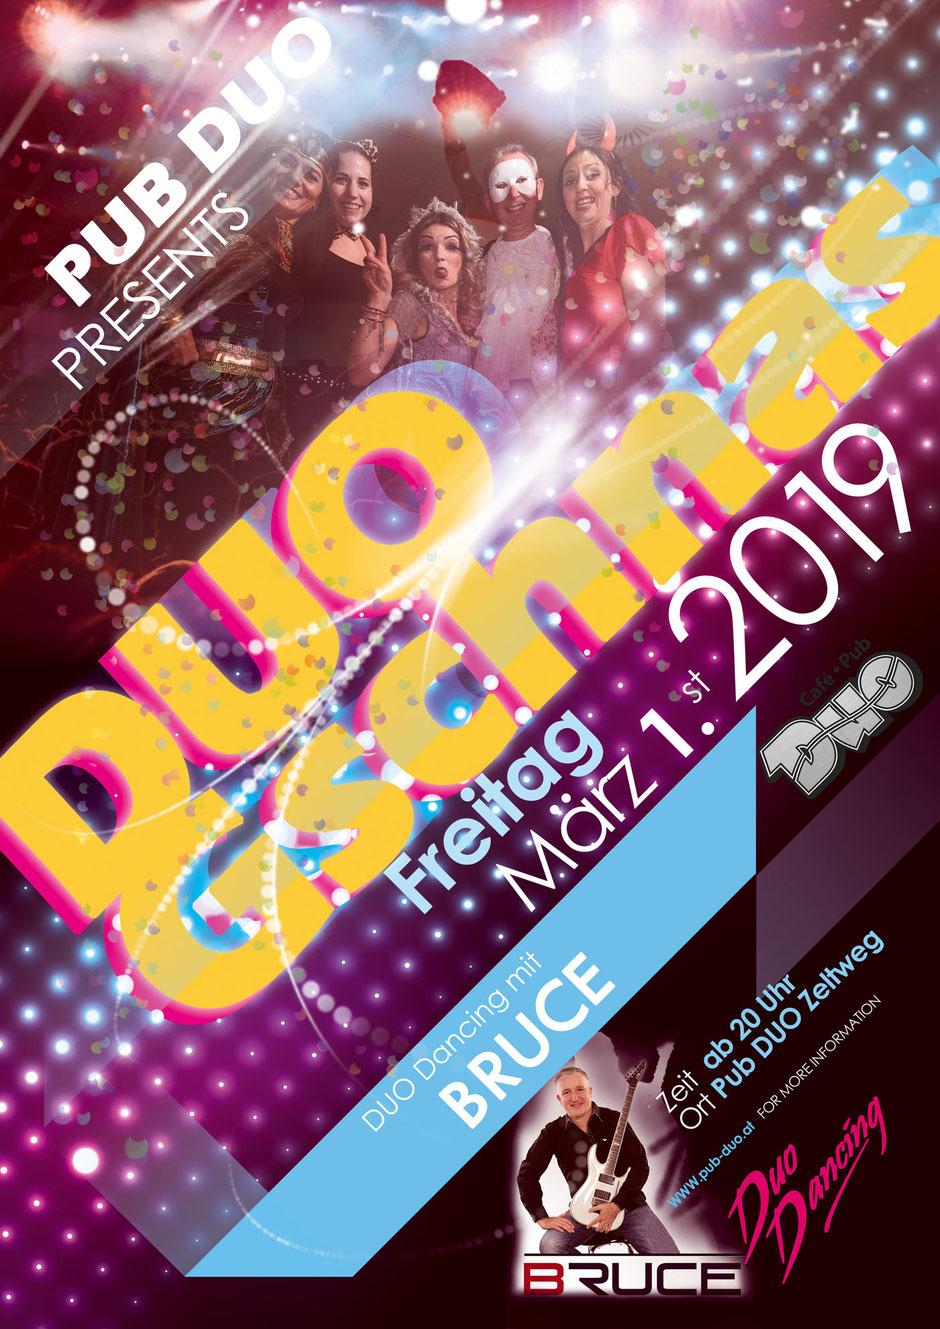 #duogschnas #gschnas #duodancing #pubduo #bruce #duo #zeltweg #murtal #party